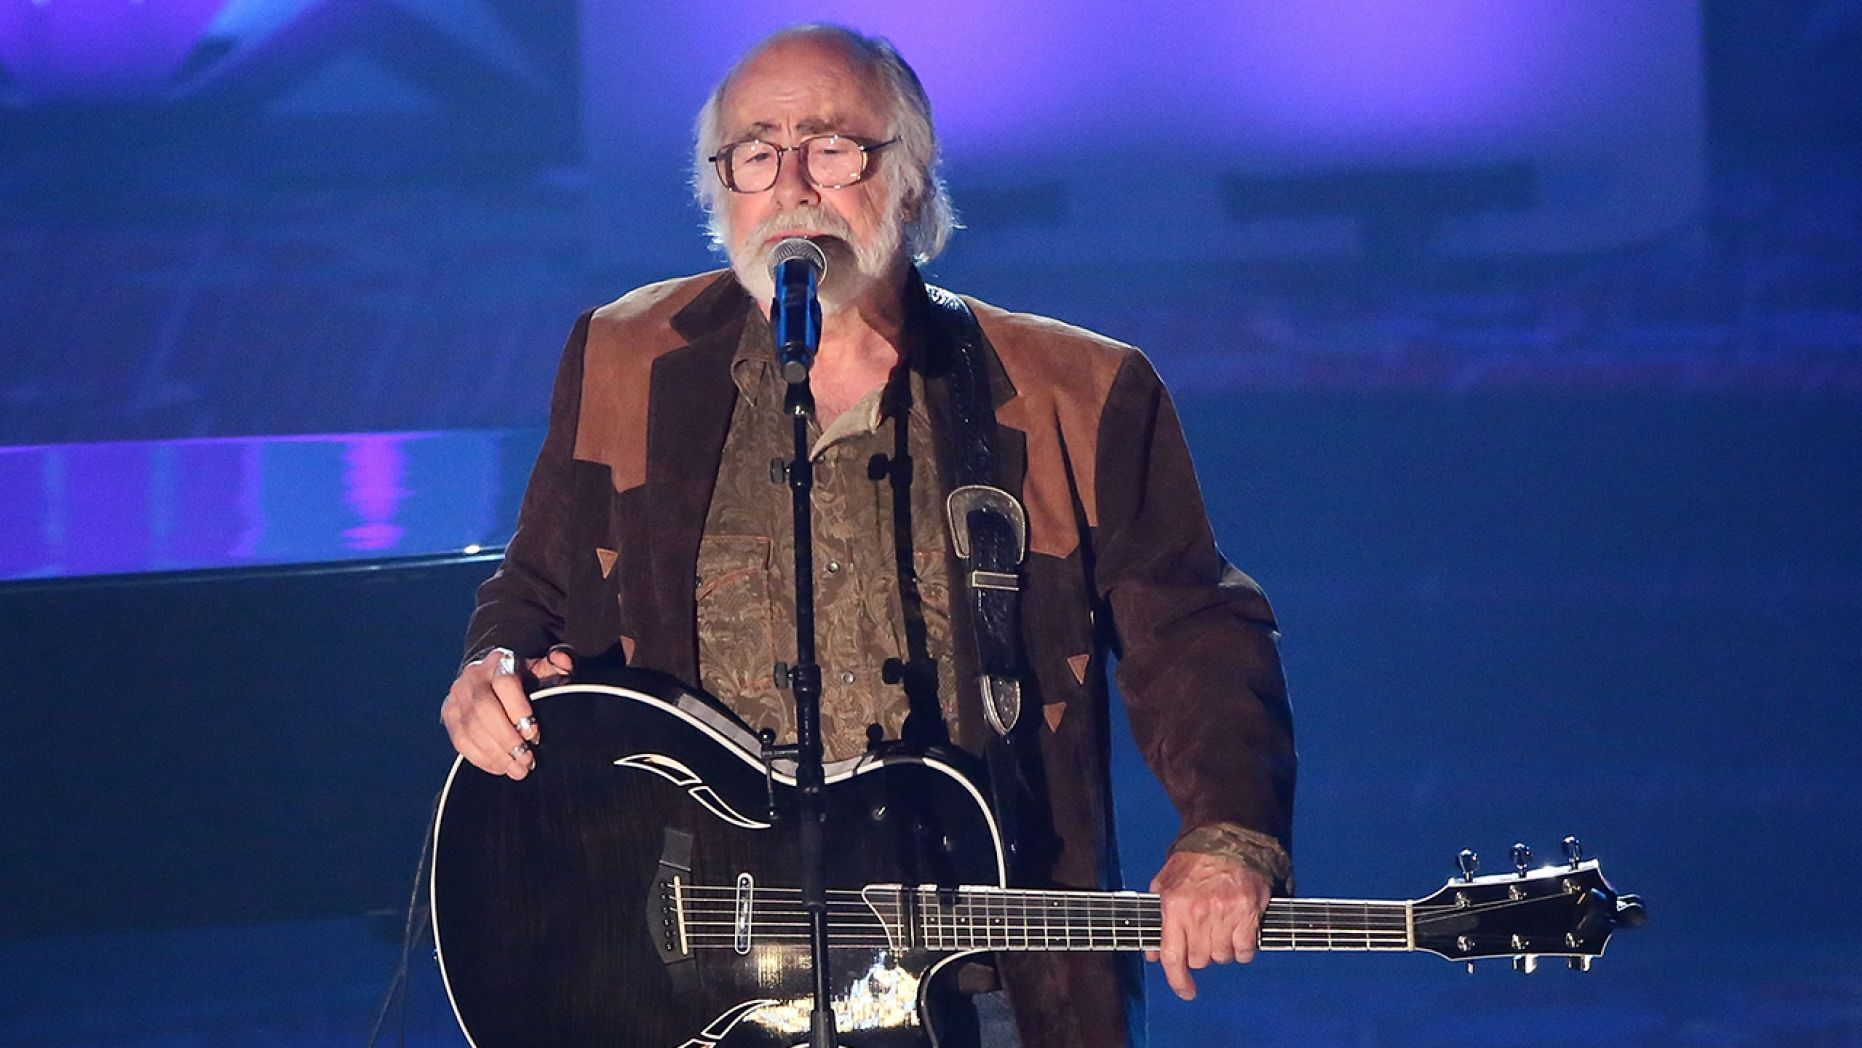 Grateful Dead lyricist Robert Hunter died at age 78.